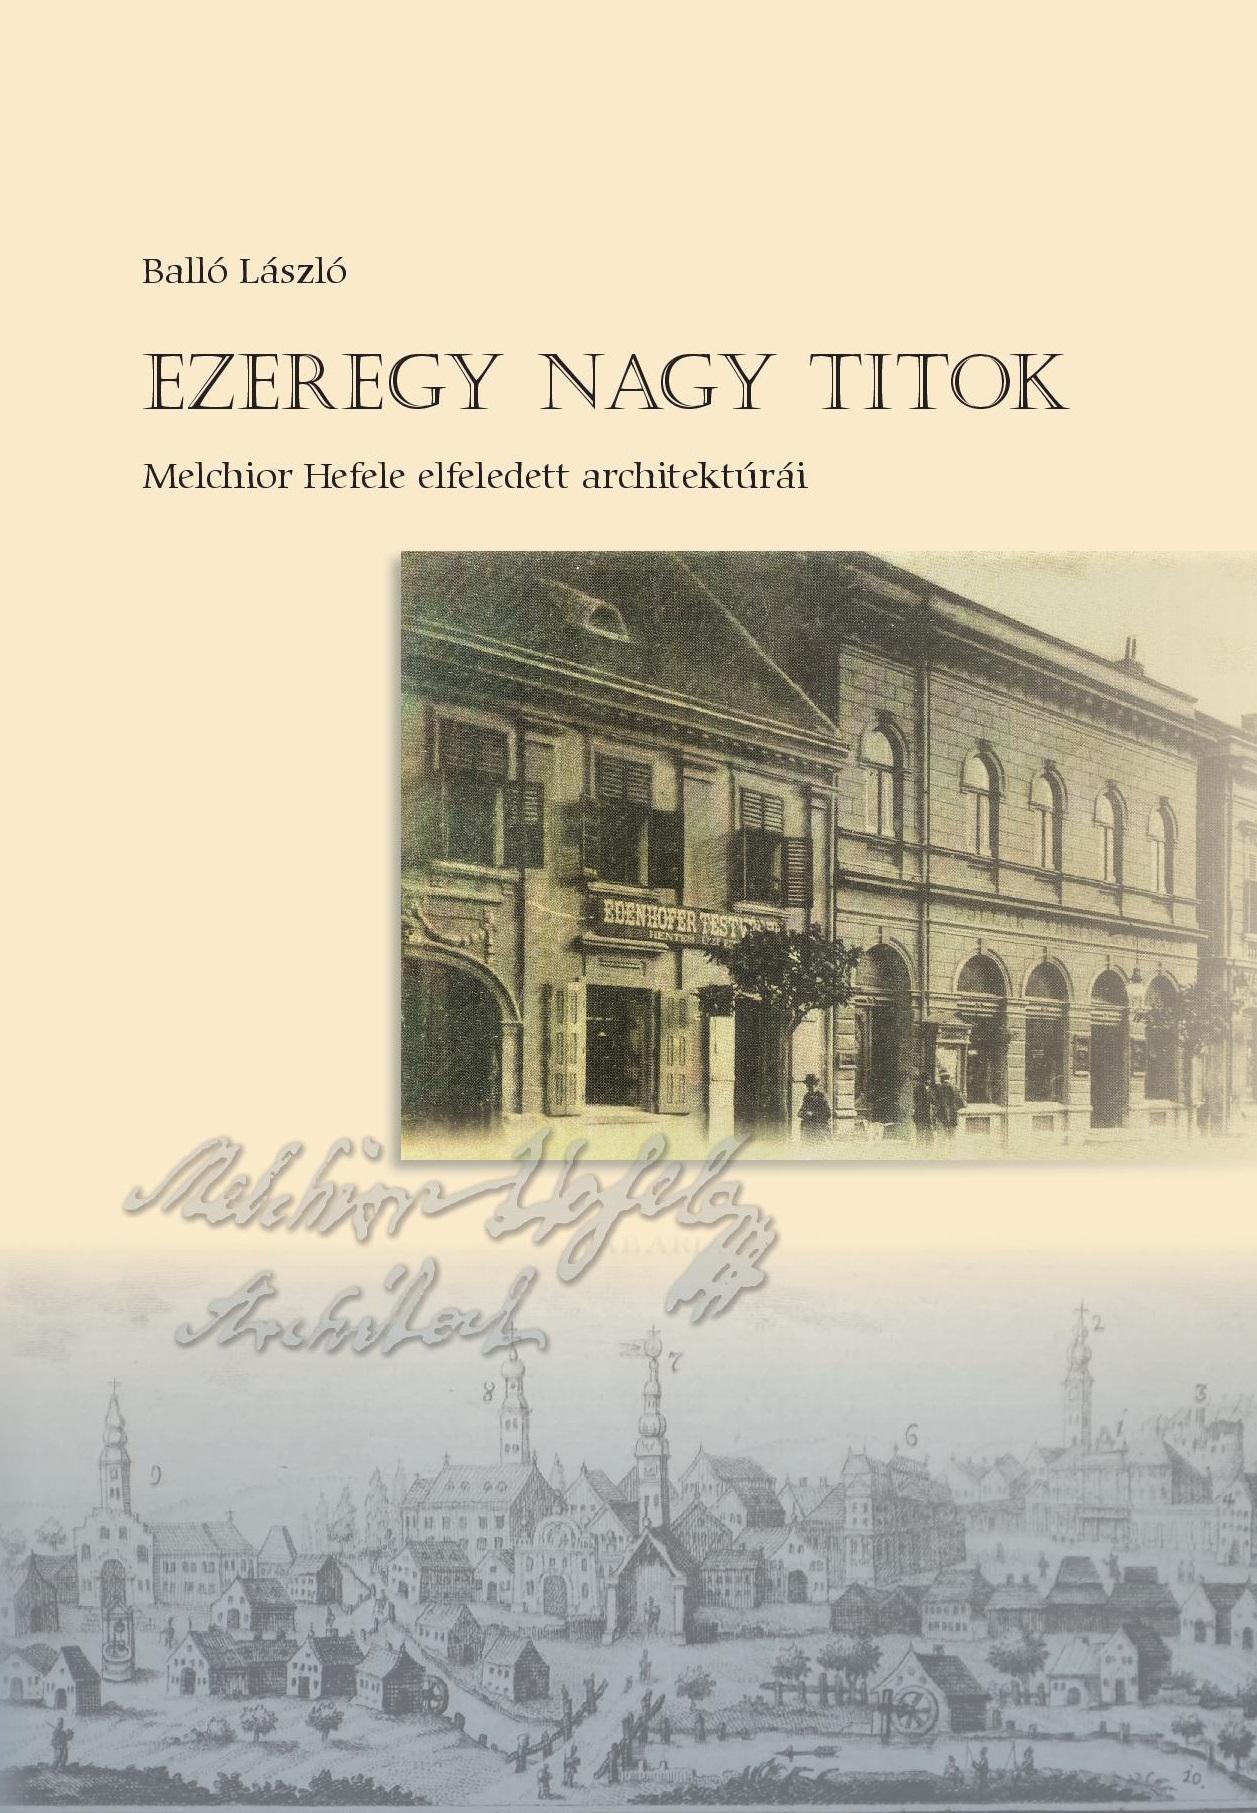 EZEREGY NAGY TITOK - MELCHIOR HEFELE ELFELEDETT ARCHITEKTÚRÁI